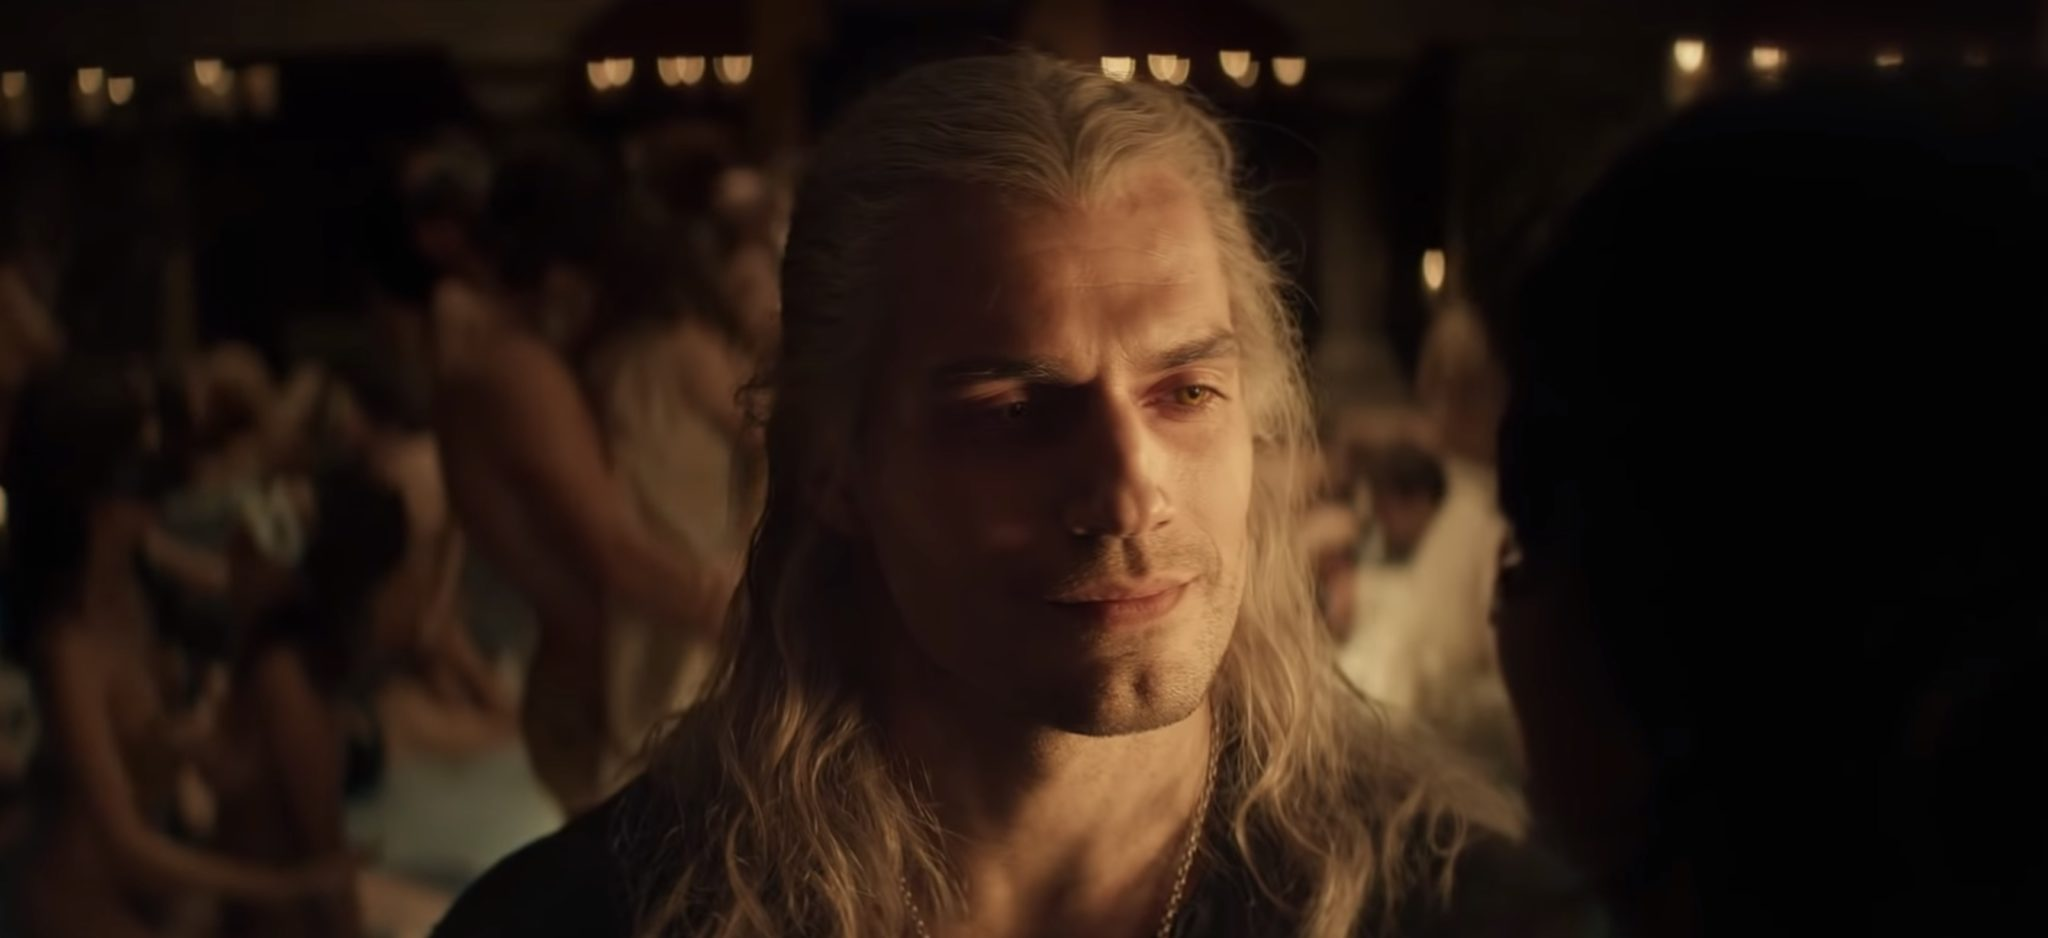 Henry Cavill, The Witcher Season 2, Netflix-https://www.youtube.com/watch?v=u8-_Nkhoryg